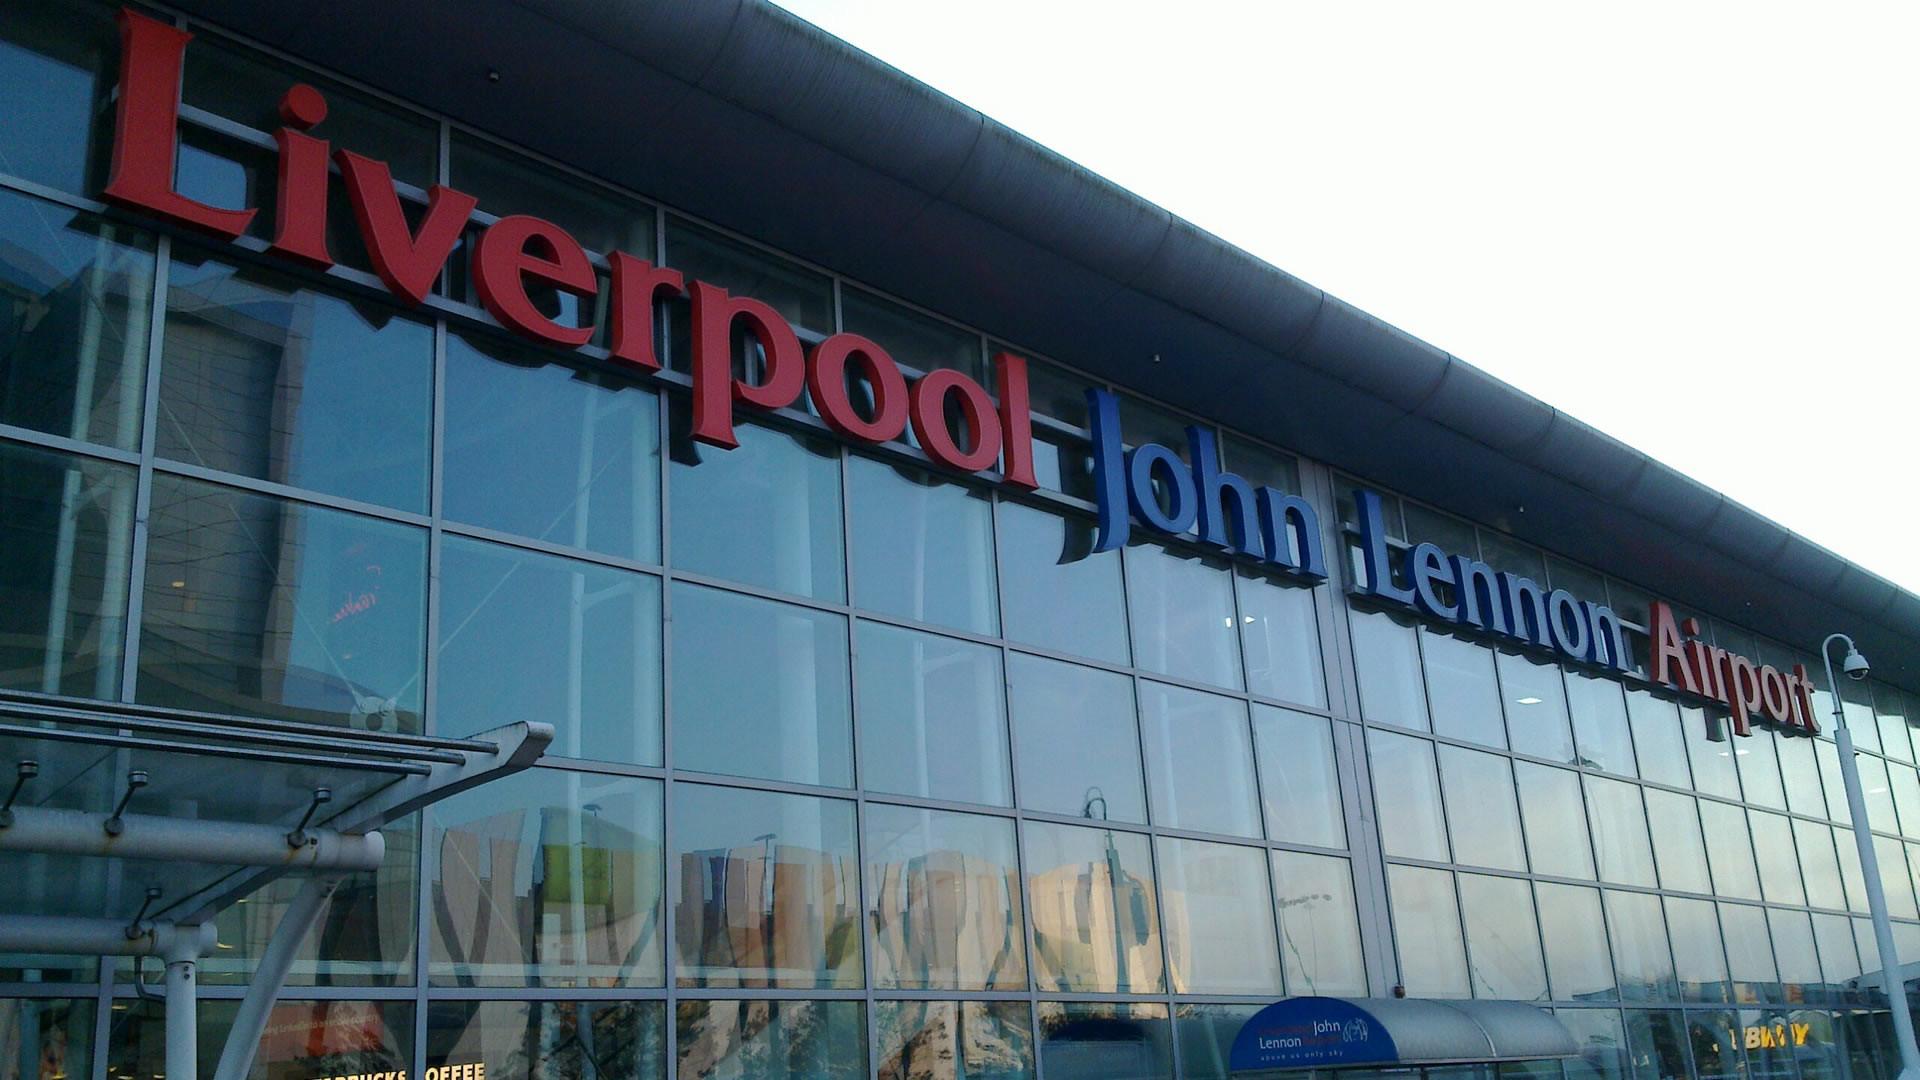 Durham - Liverpool John Lennon Airport